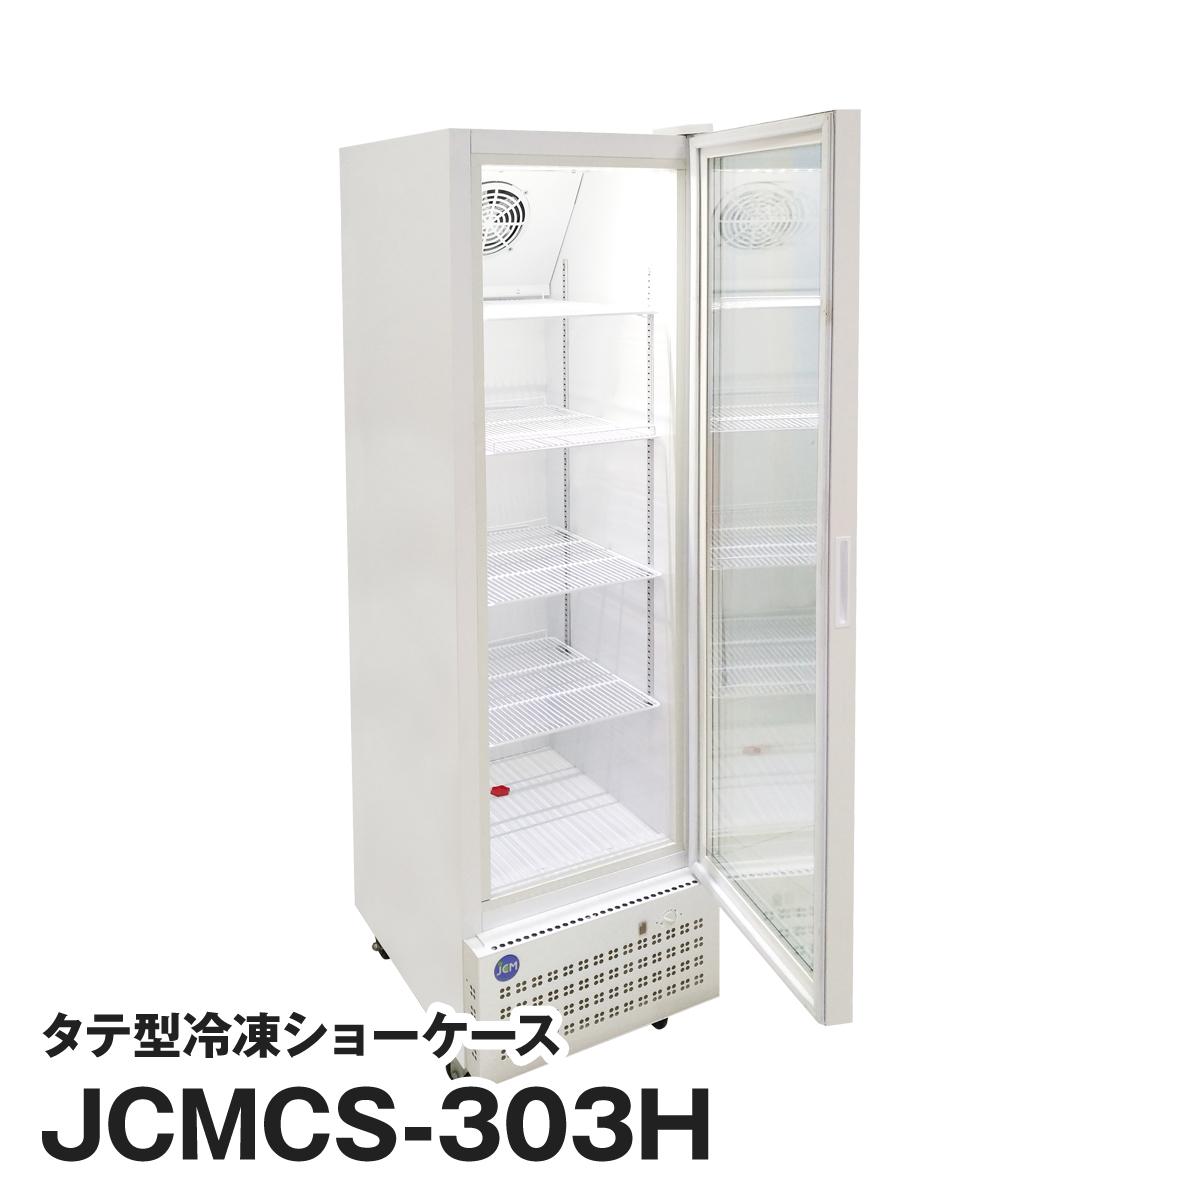 JCM社製 業務用 保冷庫 冷凍庫 303L タテ型冷凍ショーケース JCMCS-303H 新品